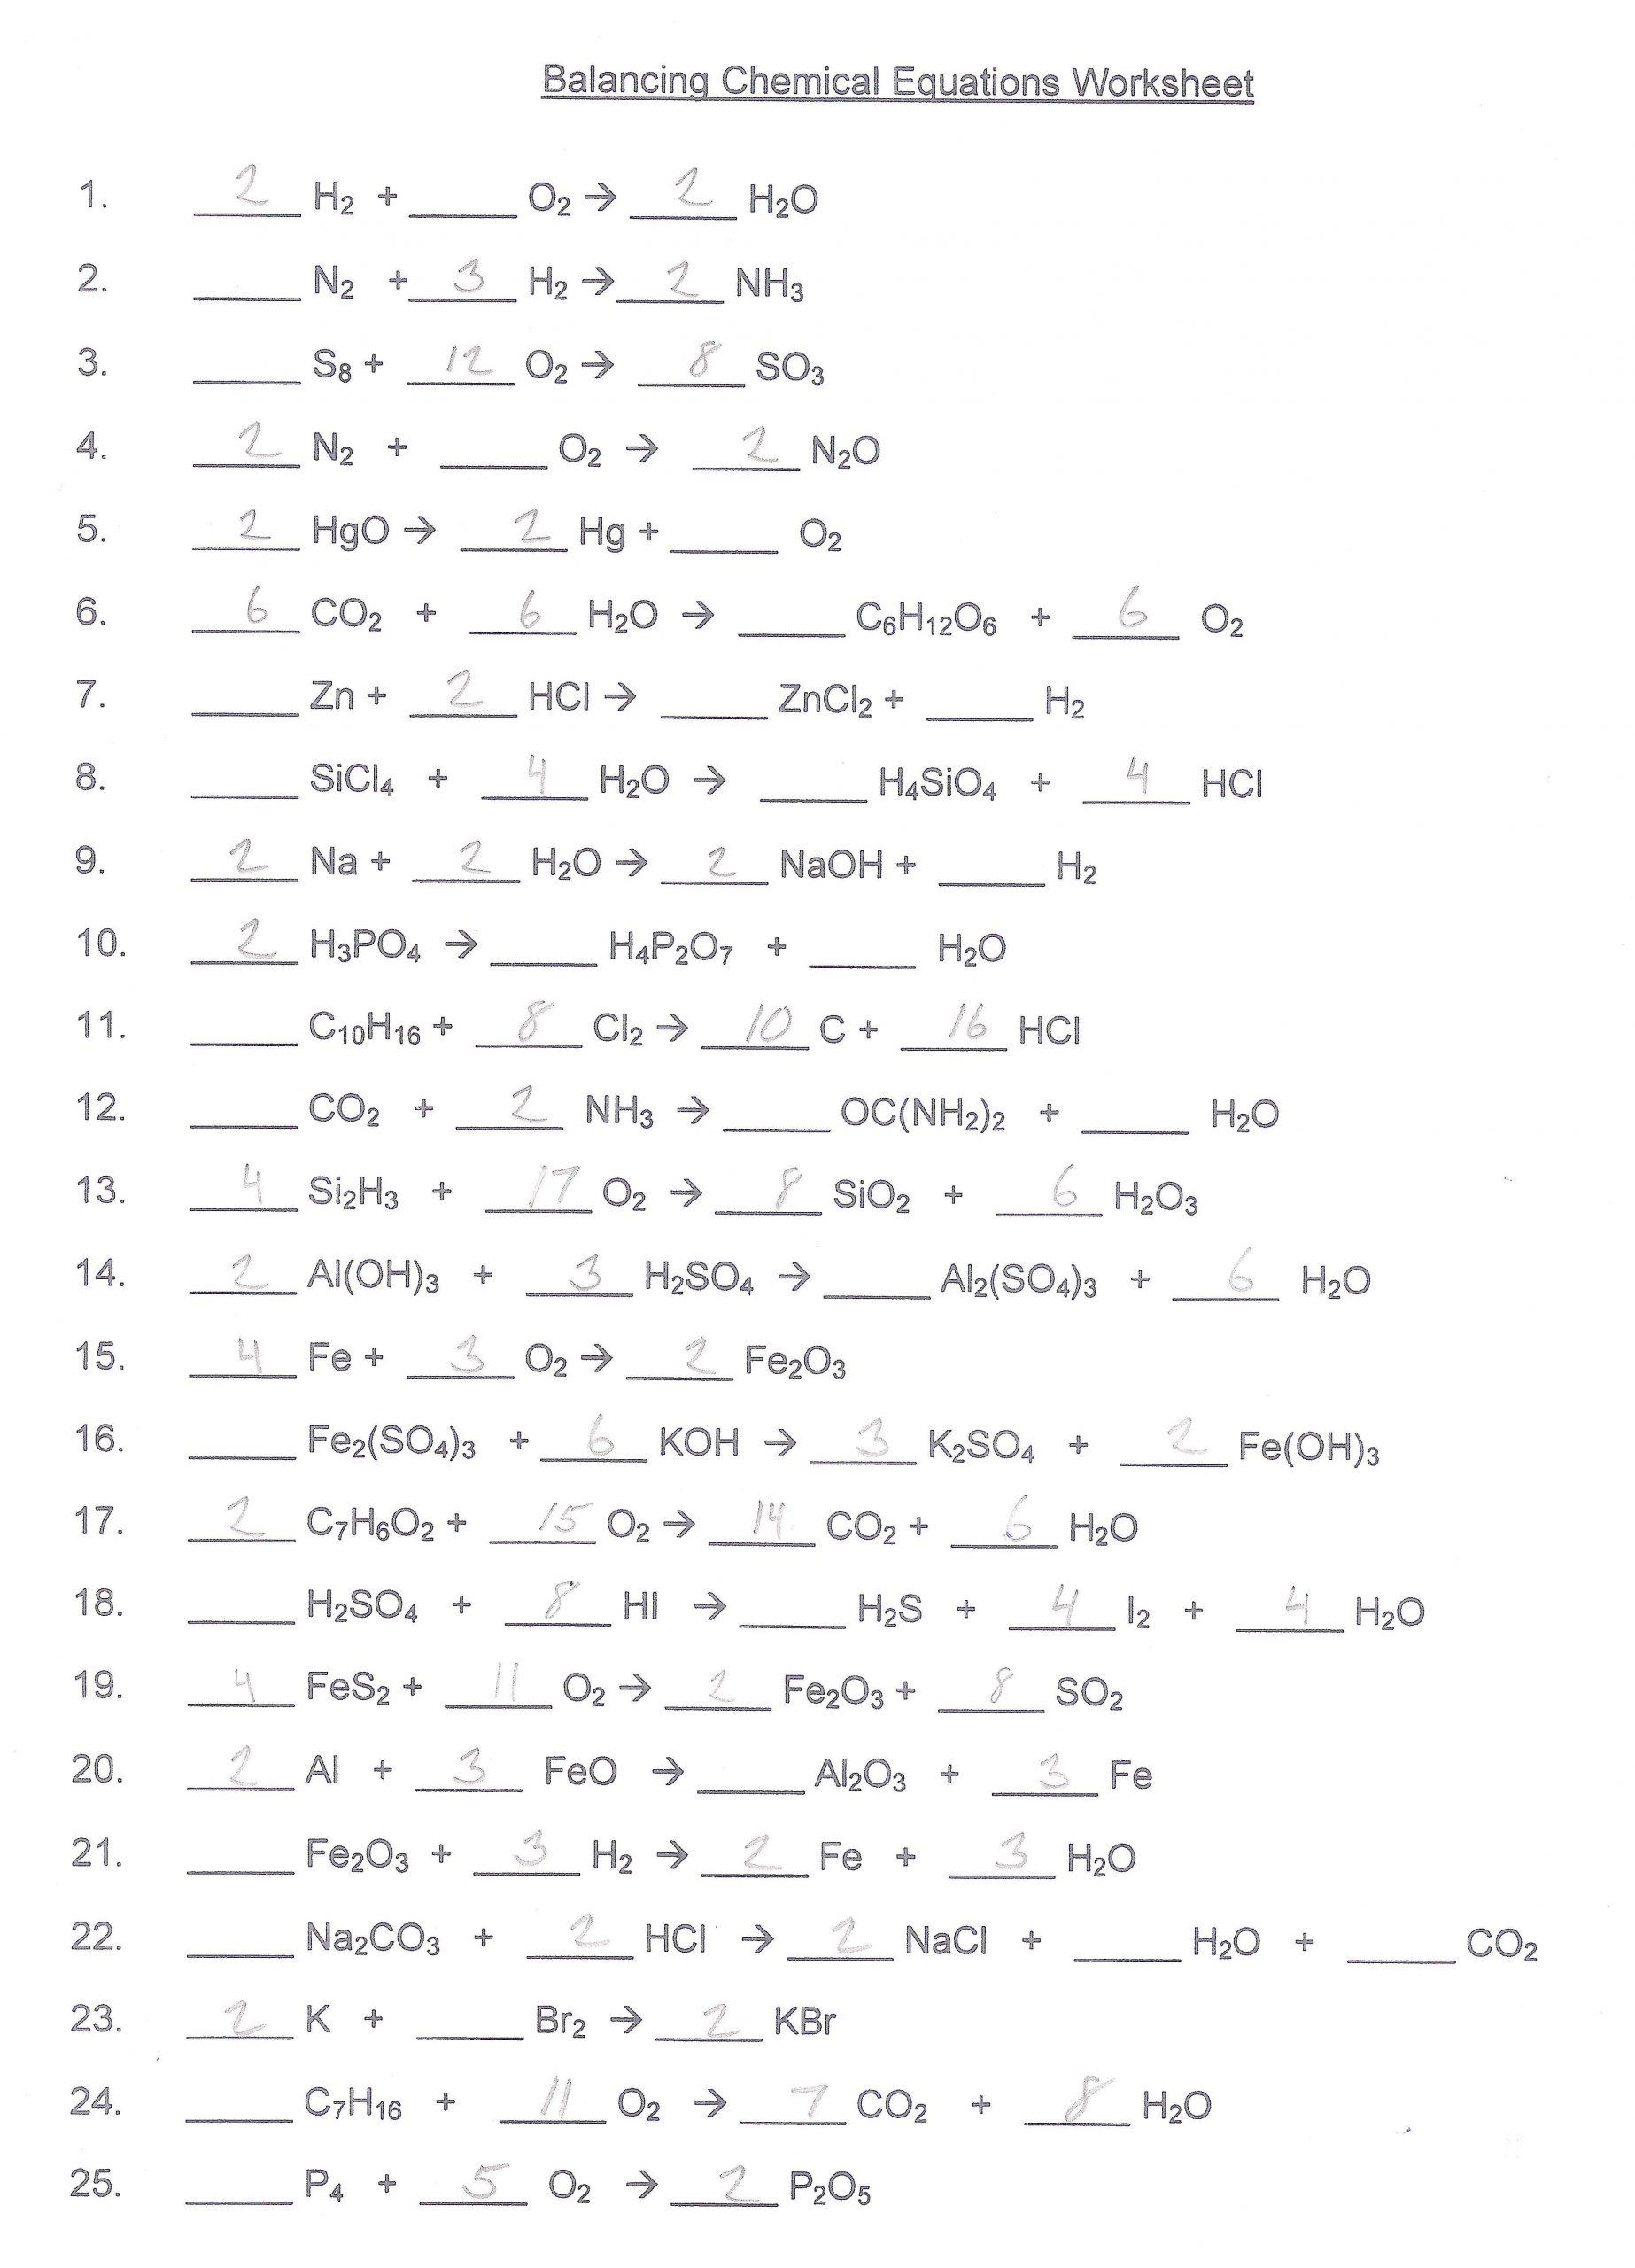 Balancing Nuclear Equations Worksheet Answers Balancing Chemical Equations Worksheet Answer Key